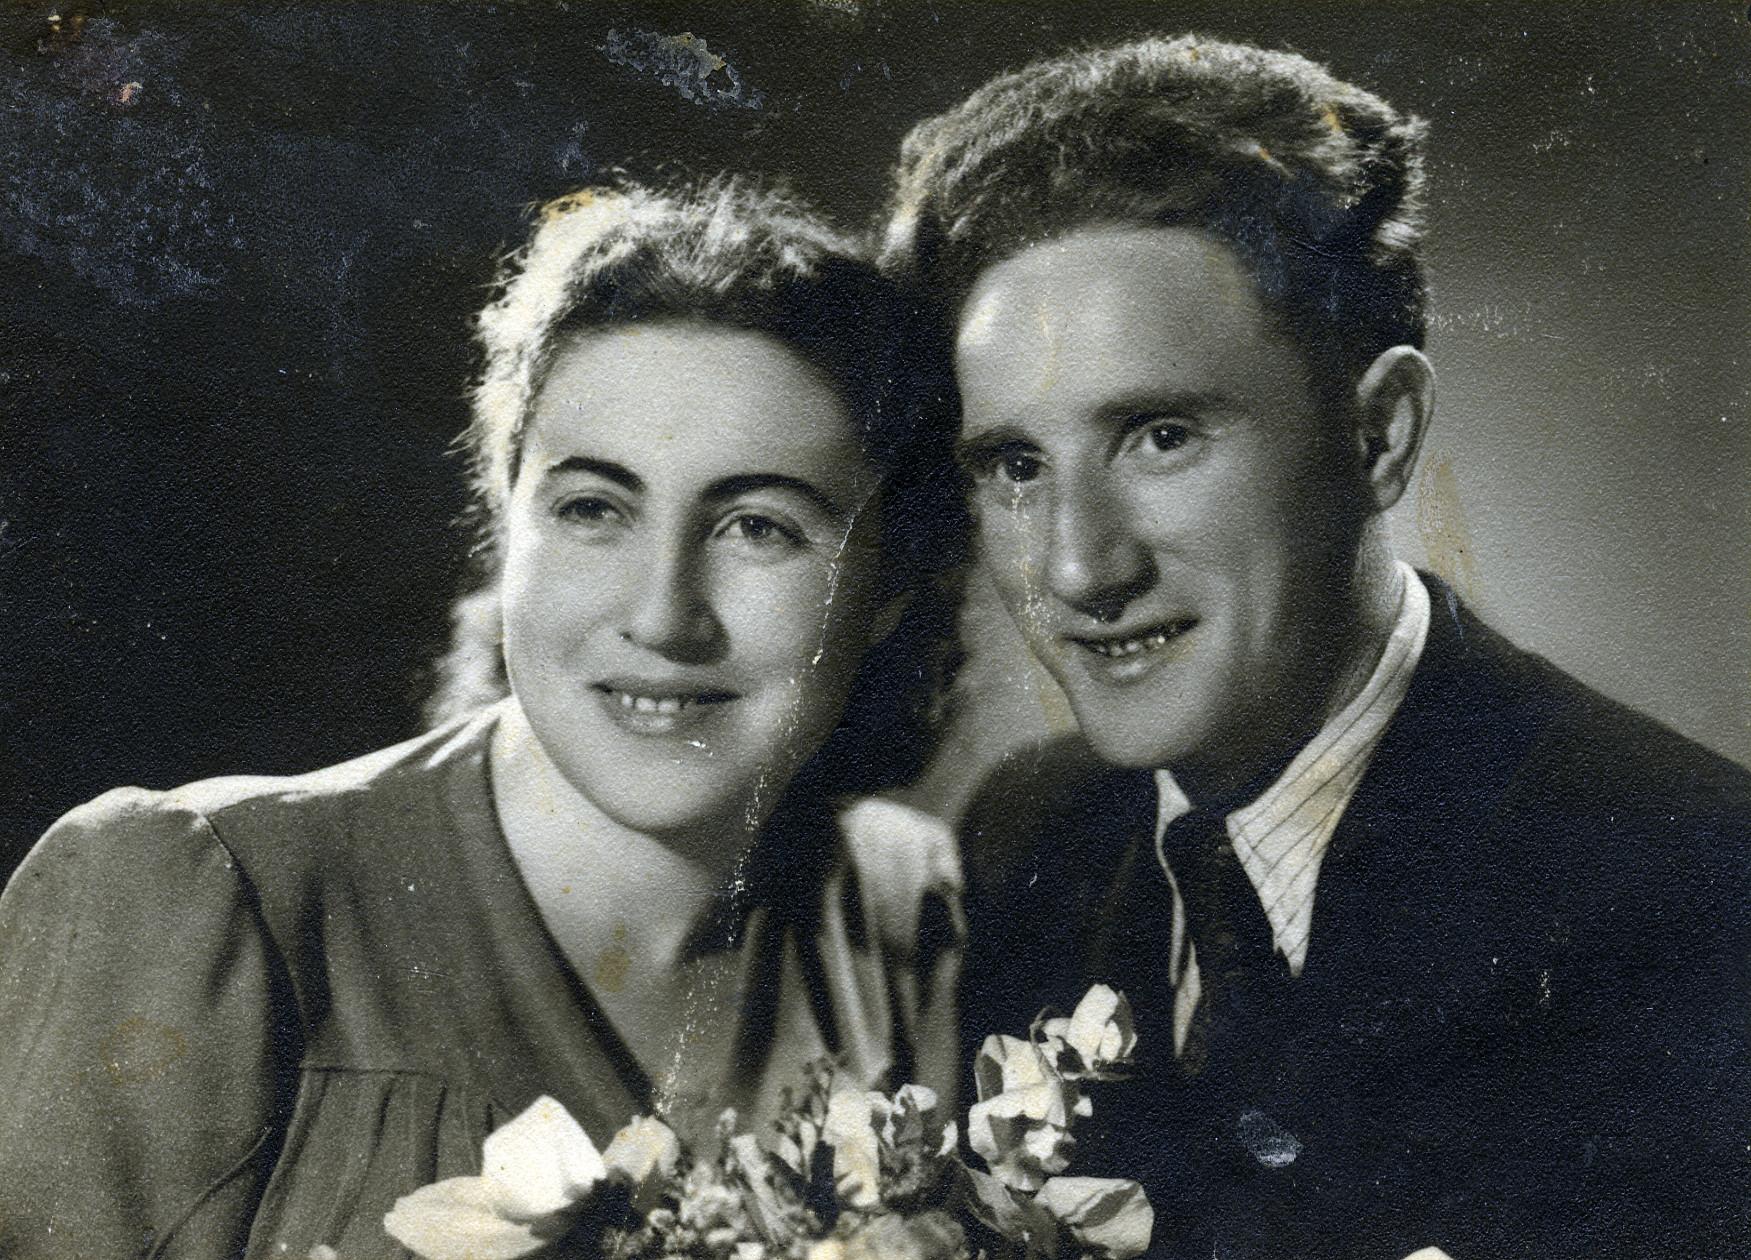 Postwar wedding photograph of survivors from Kalisz, Poland.   Pictured are Ester (nee Gluba) and Jeszaayahu Kawe.